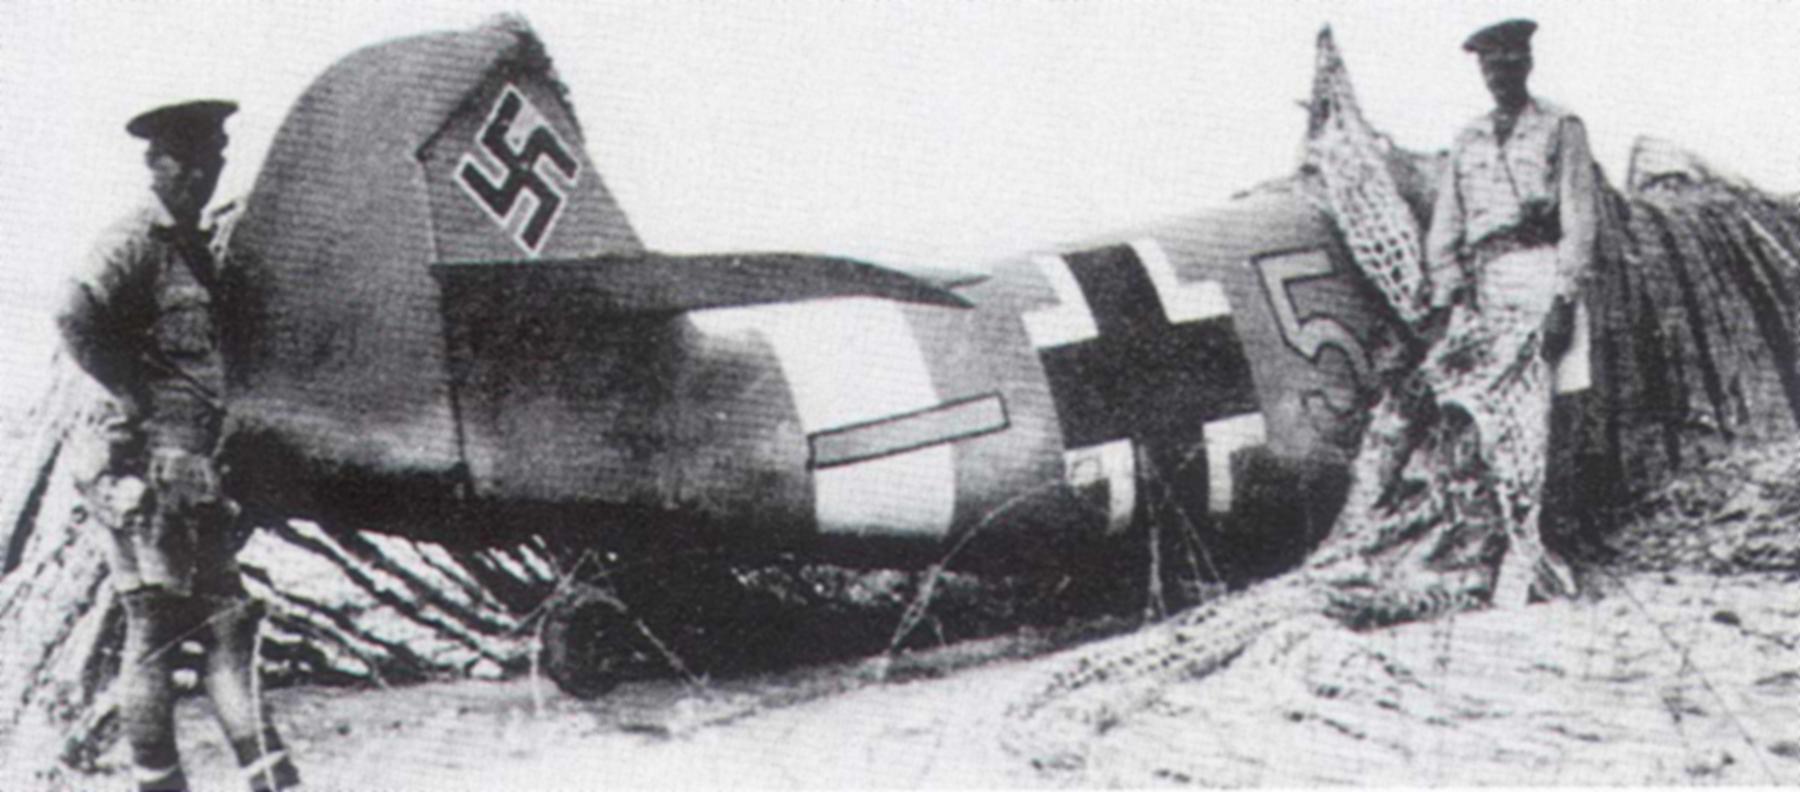 Messerschmitt Bf 109F4Trop 6.JG27 Yellow 5 Gehard Mix WNr 10074 crashed El Alamein Egypt Aug 14 1942 02